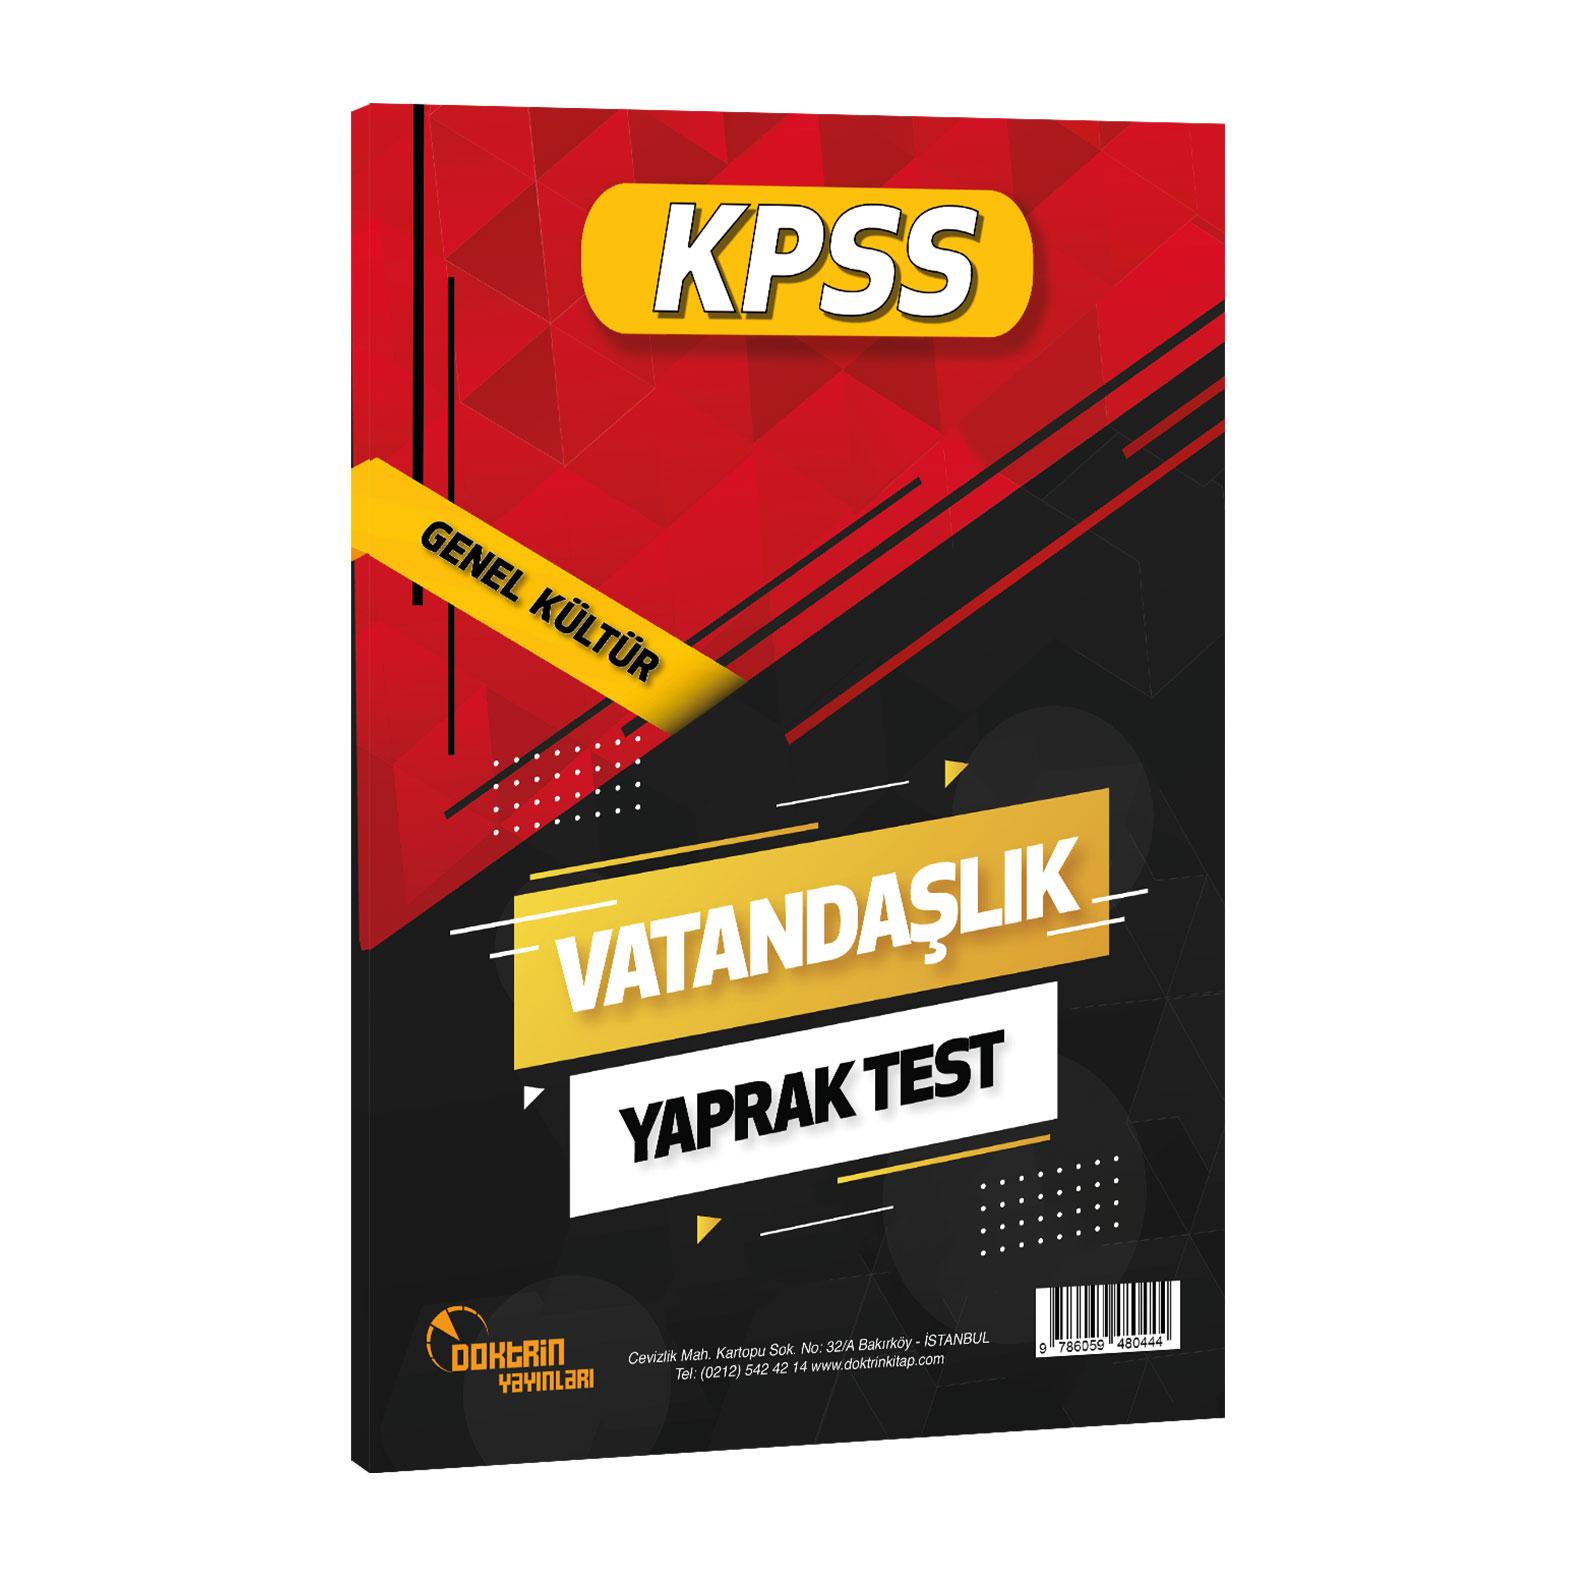 2021 KPSS Vatandaşlık Yaprak Test